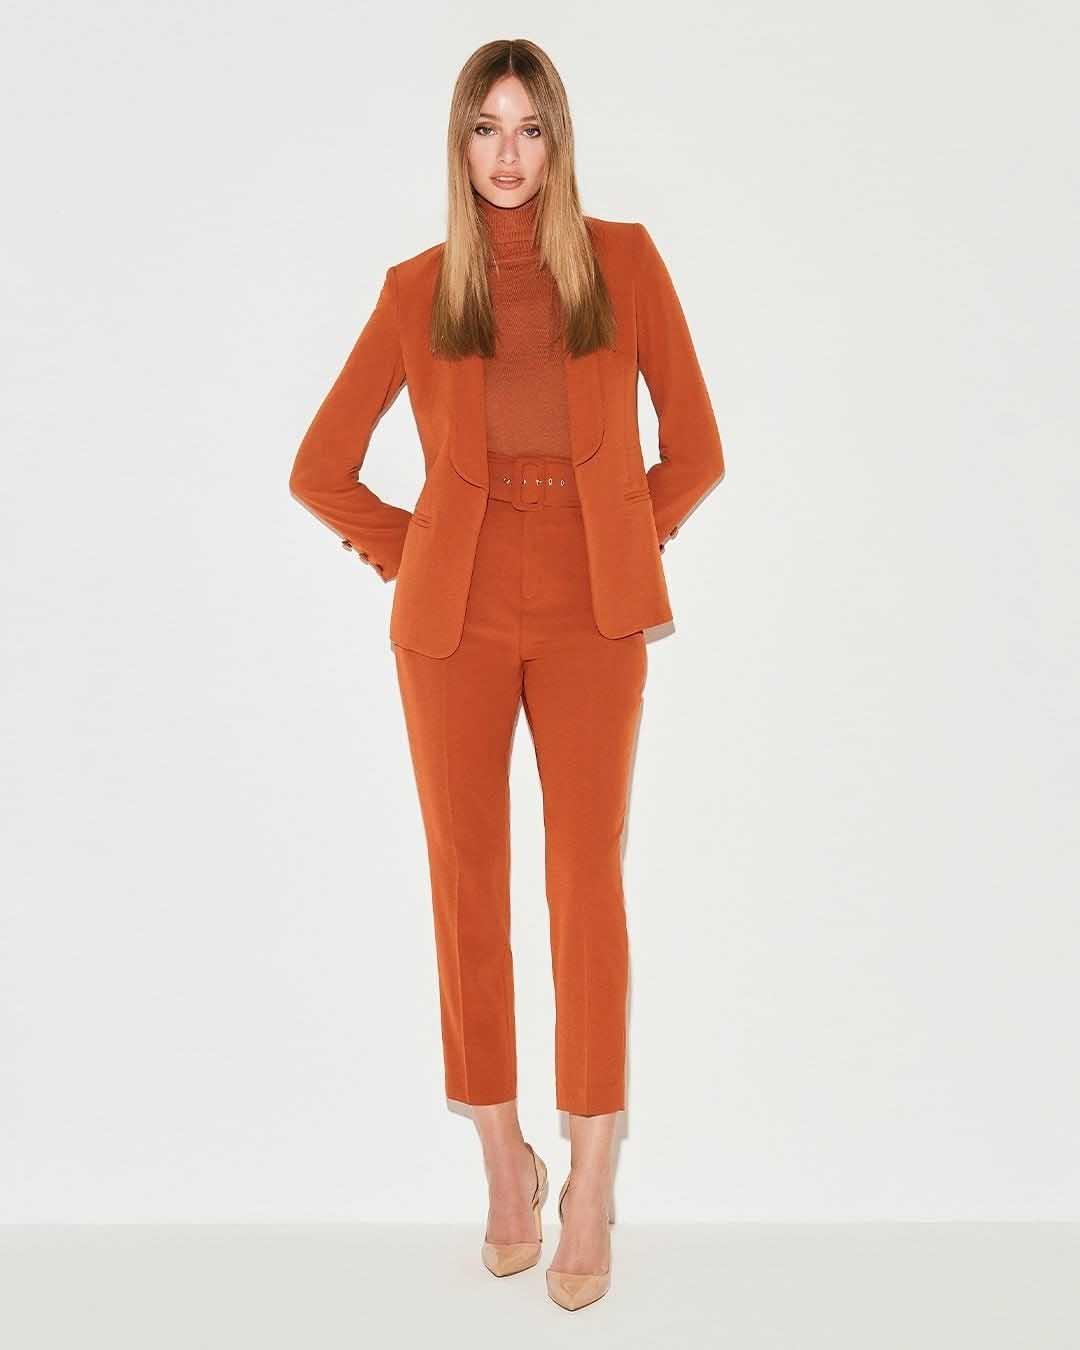 trajes invierno 2021 mujer